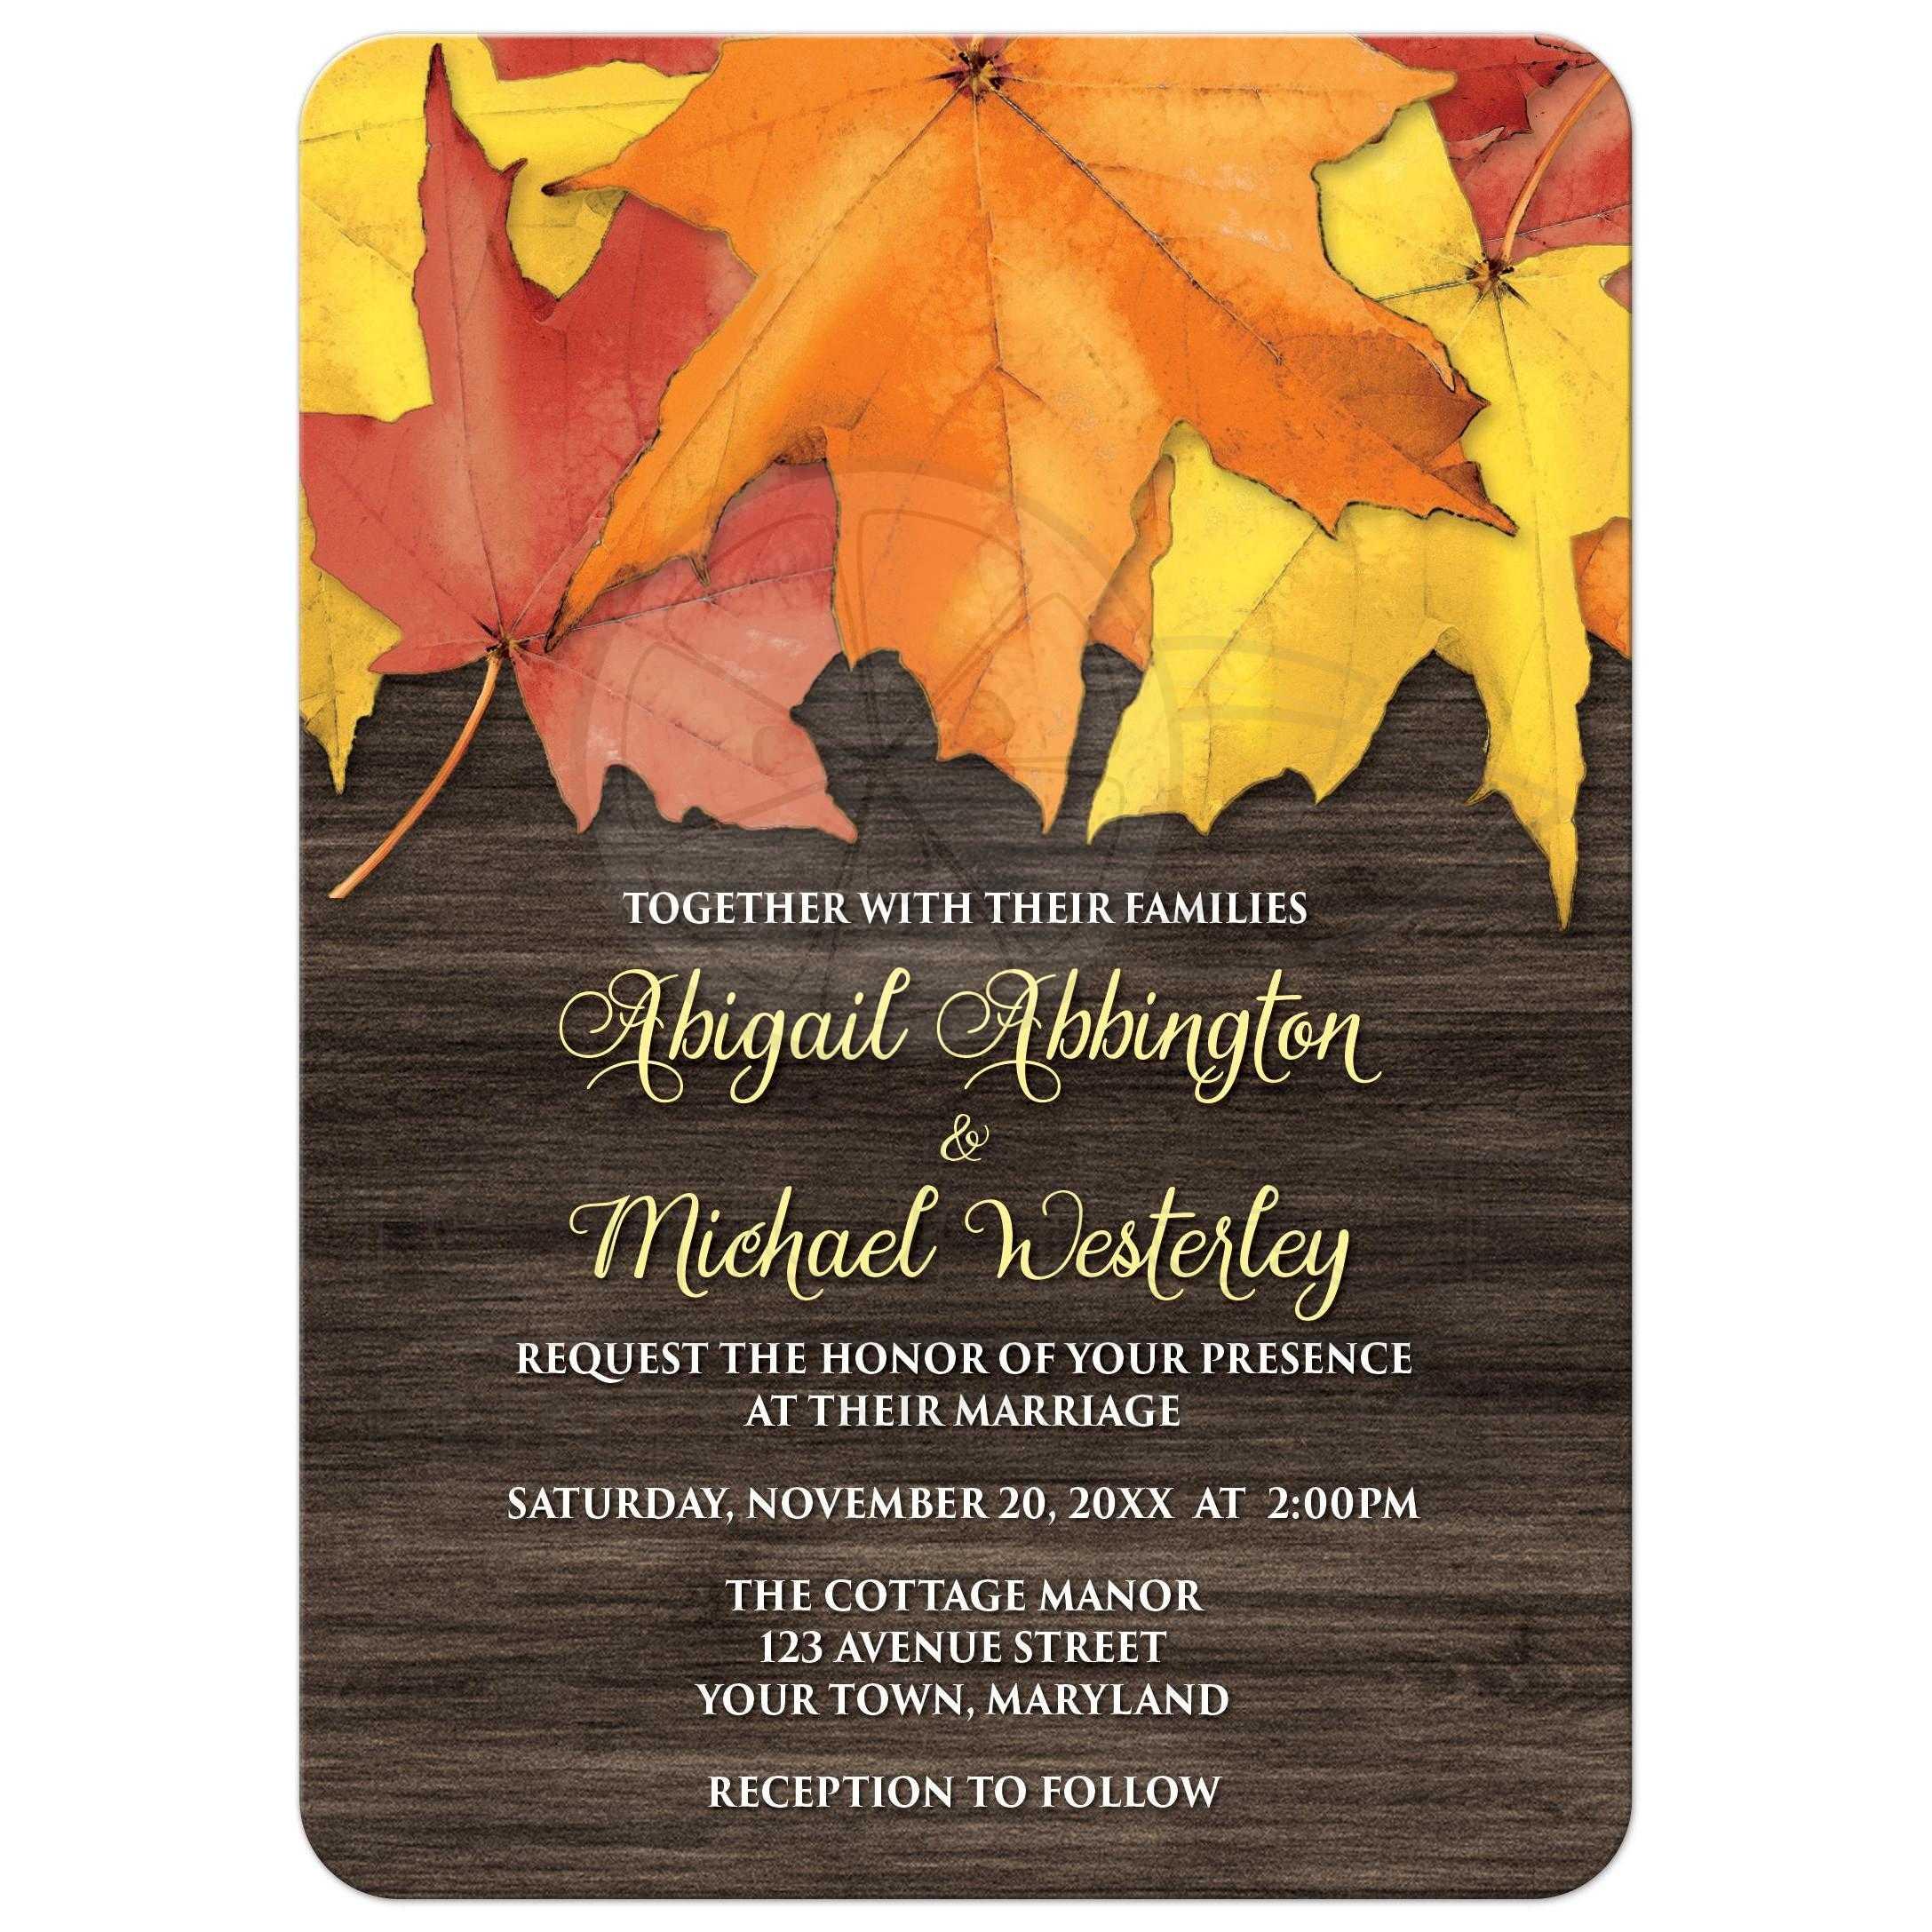 rustic wood wedding invitations wood wedding invitations wedding invitations rustic autumn leaves and wood